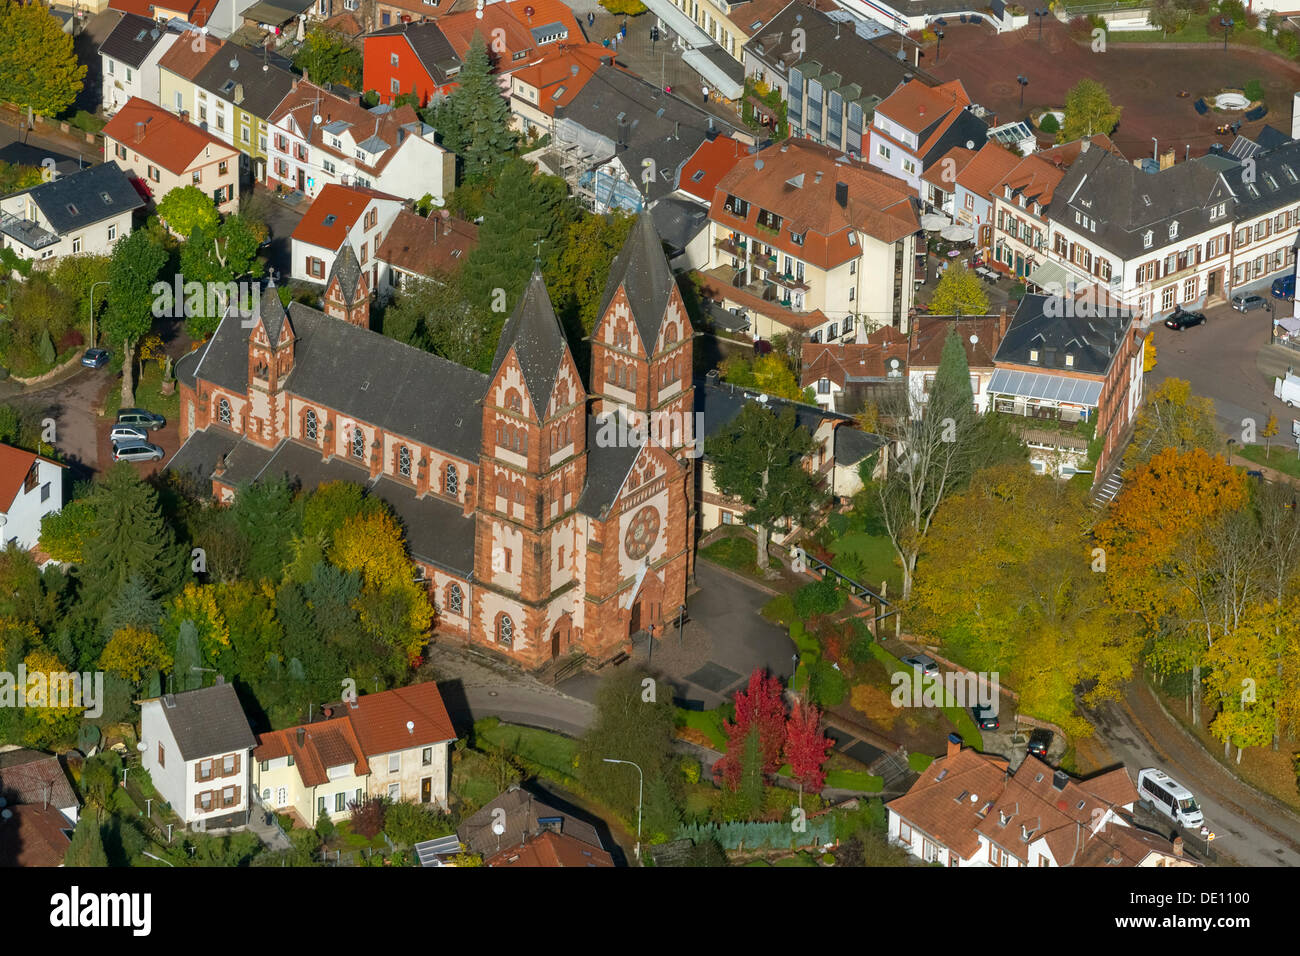 Aerial view, parish church of Saint Lutwinus - Stock Image